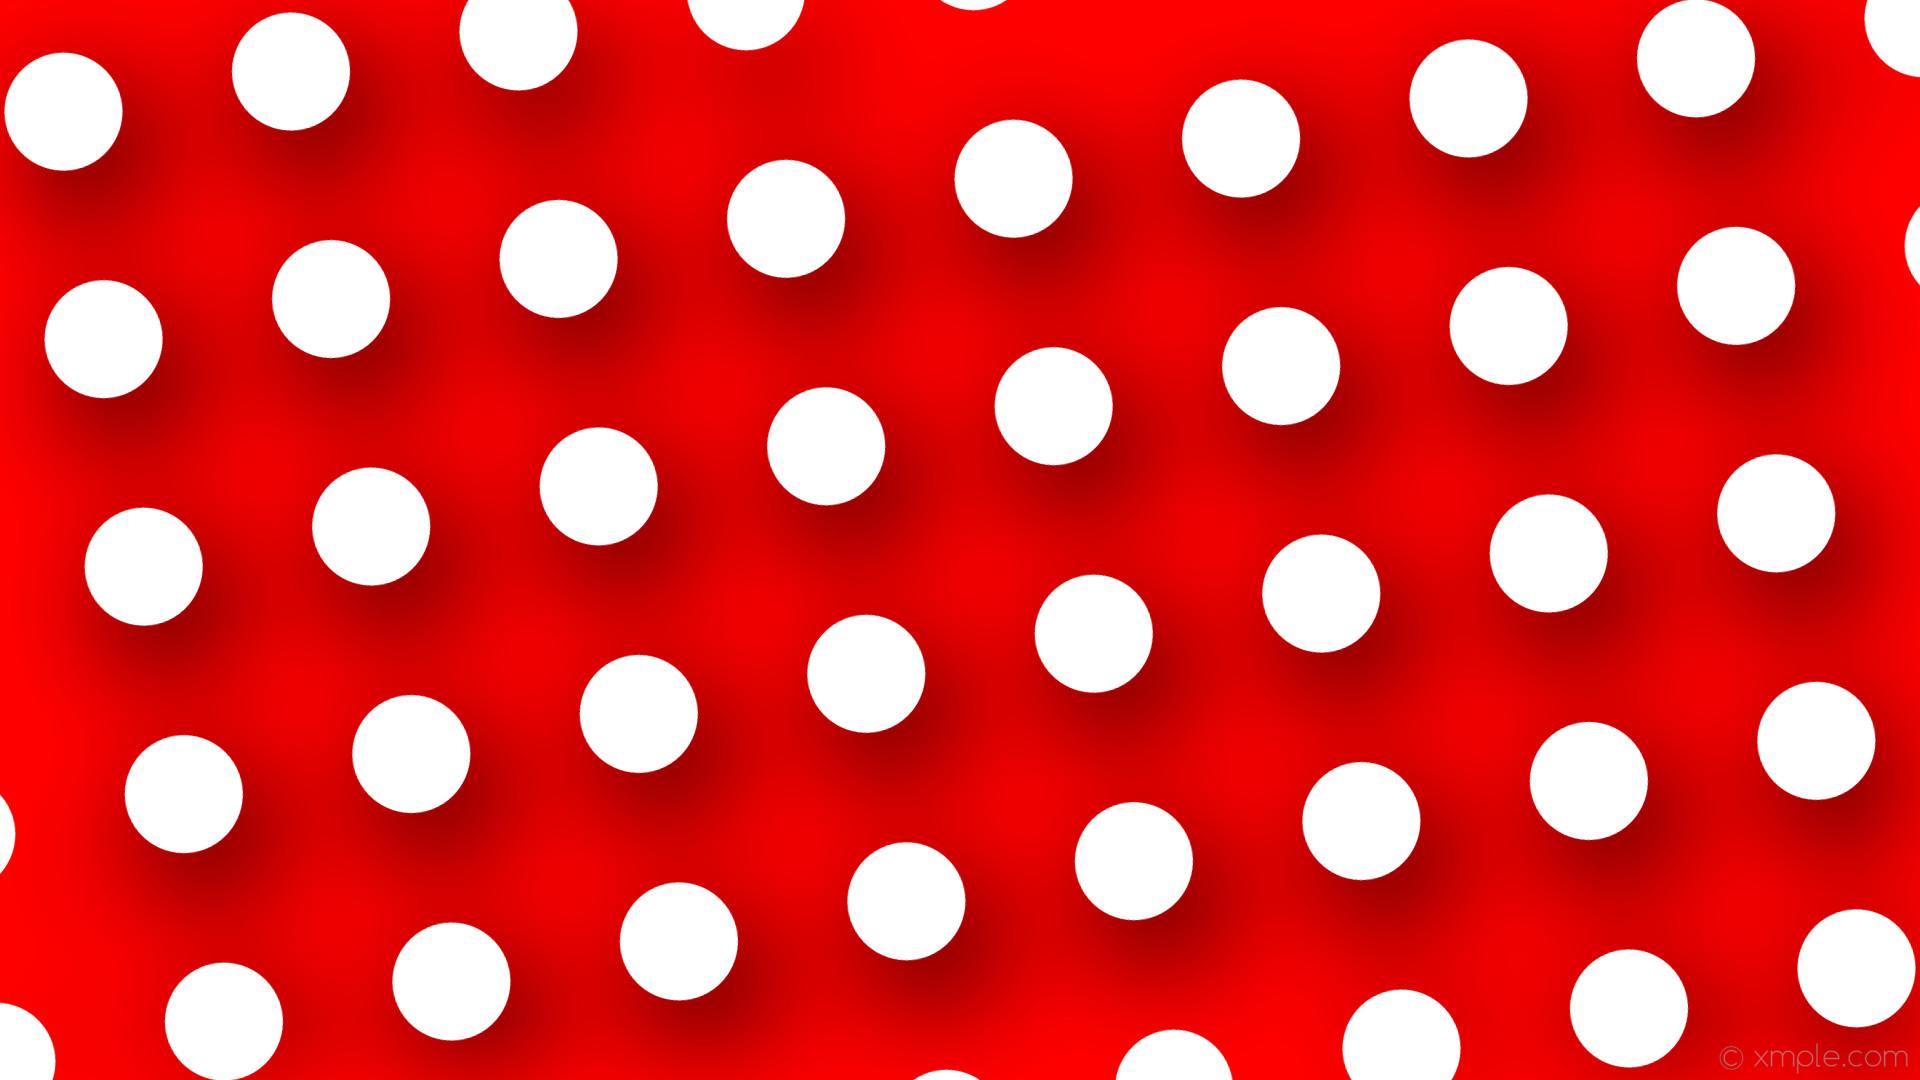 Wallpaper red white dots drop shadow polka #ff0000 #ffffff .